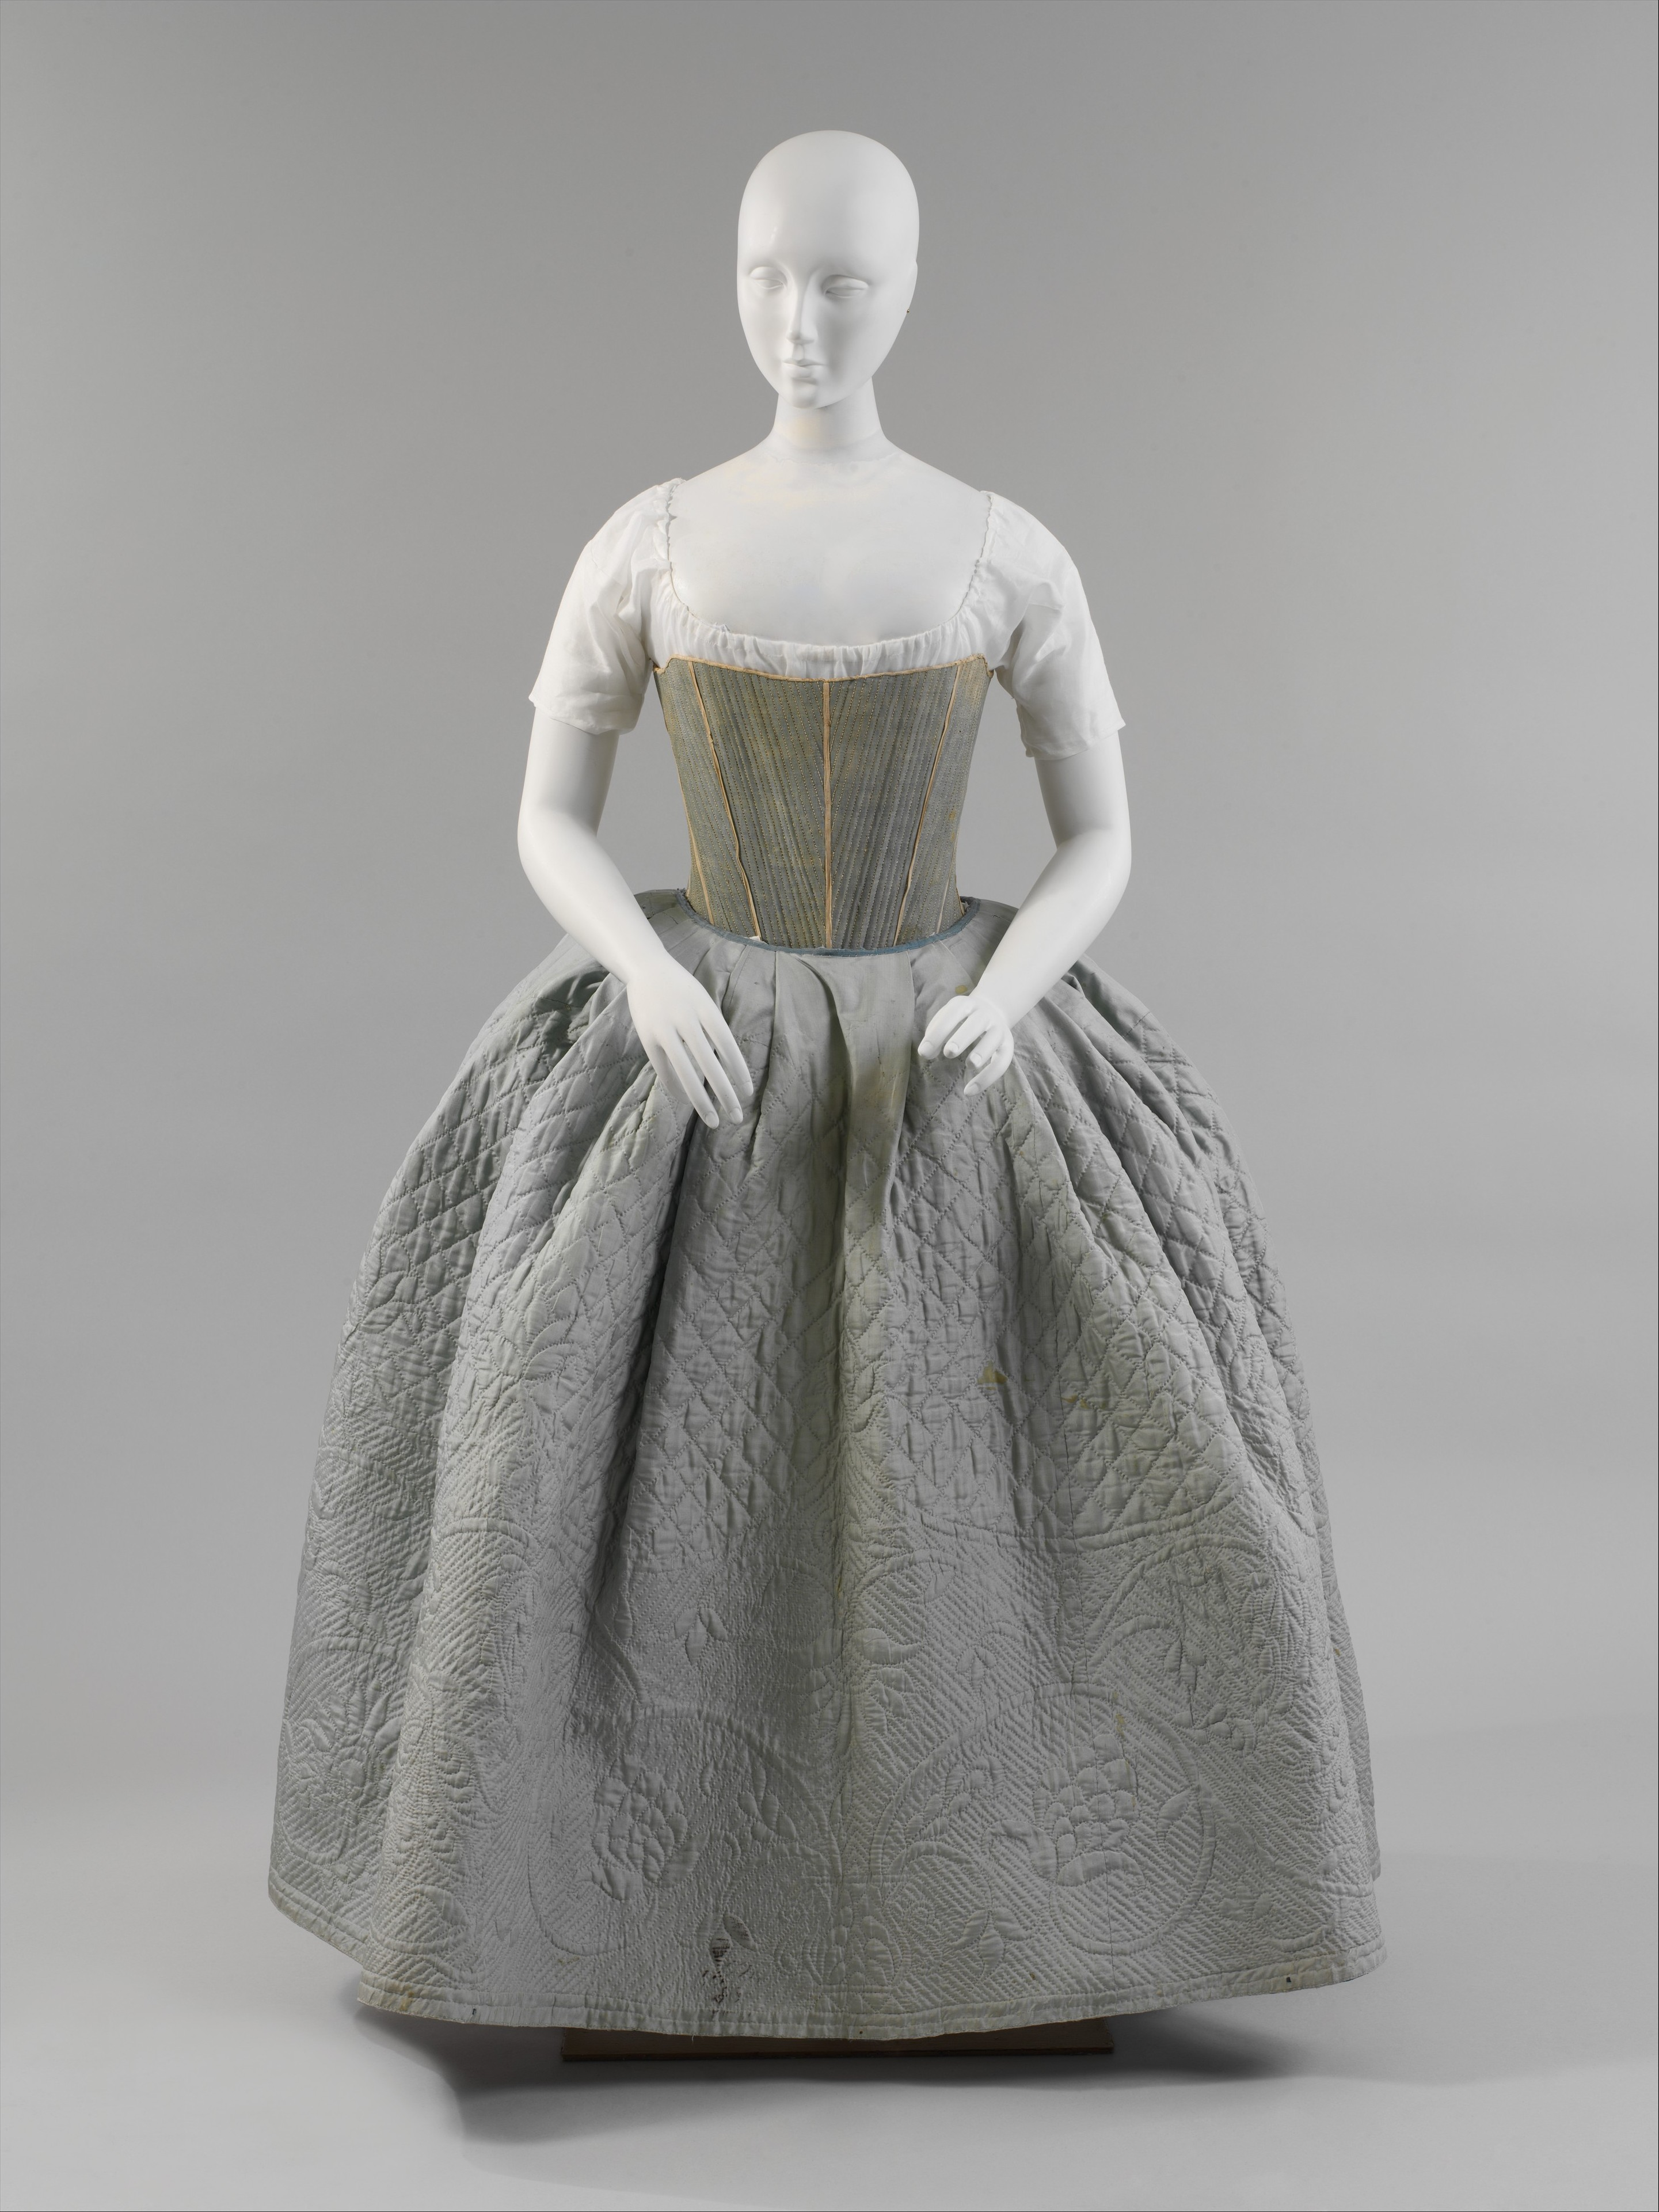 Petticoat | American | The Met